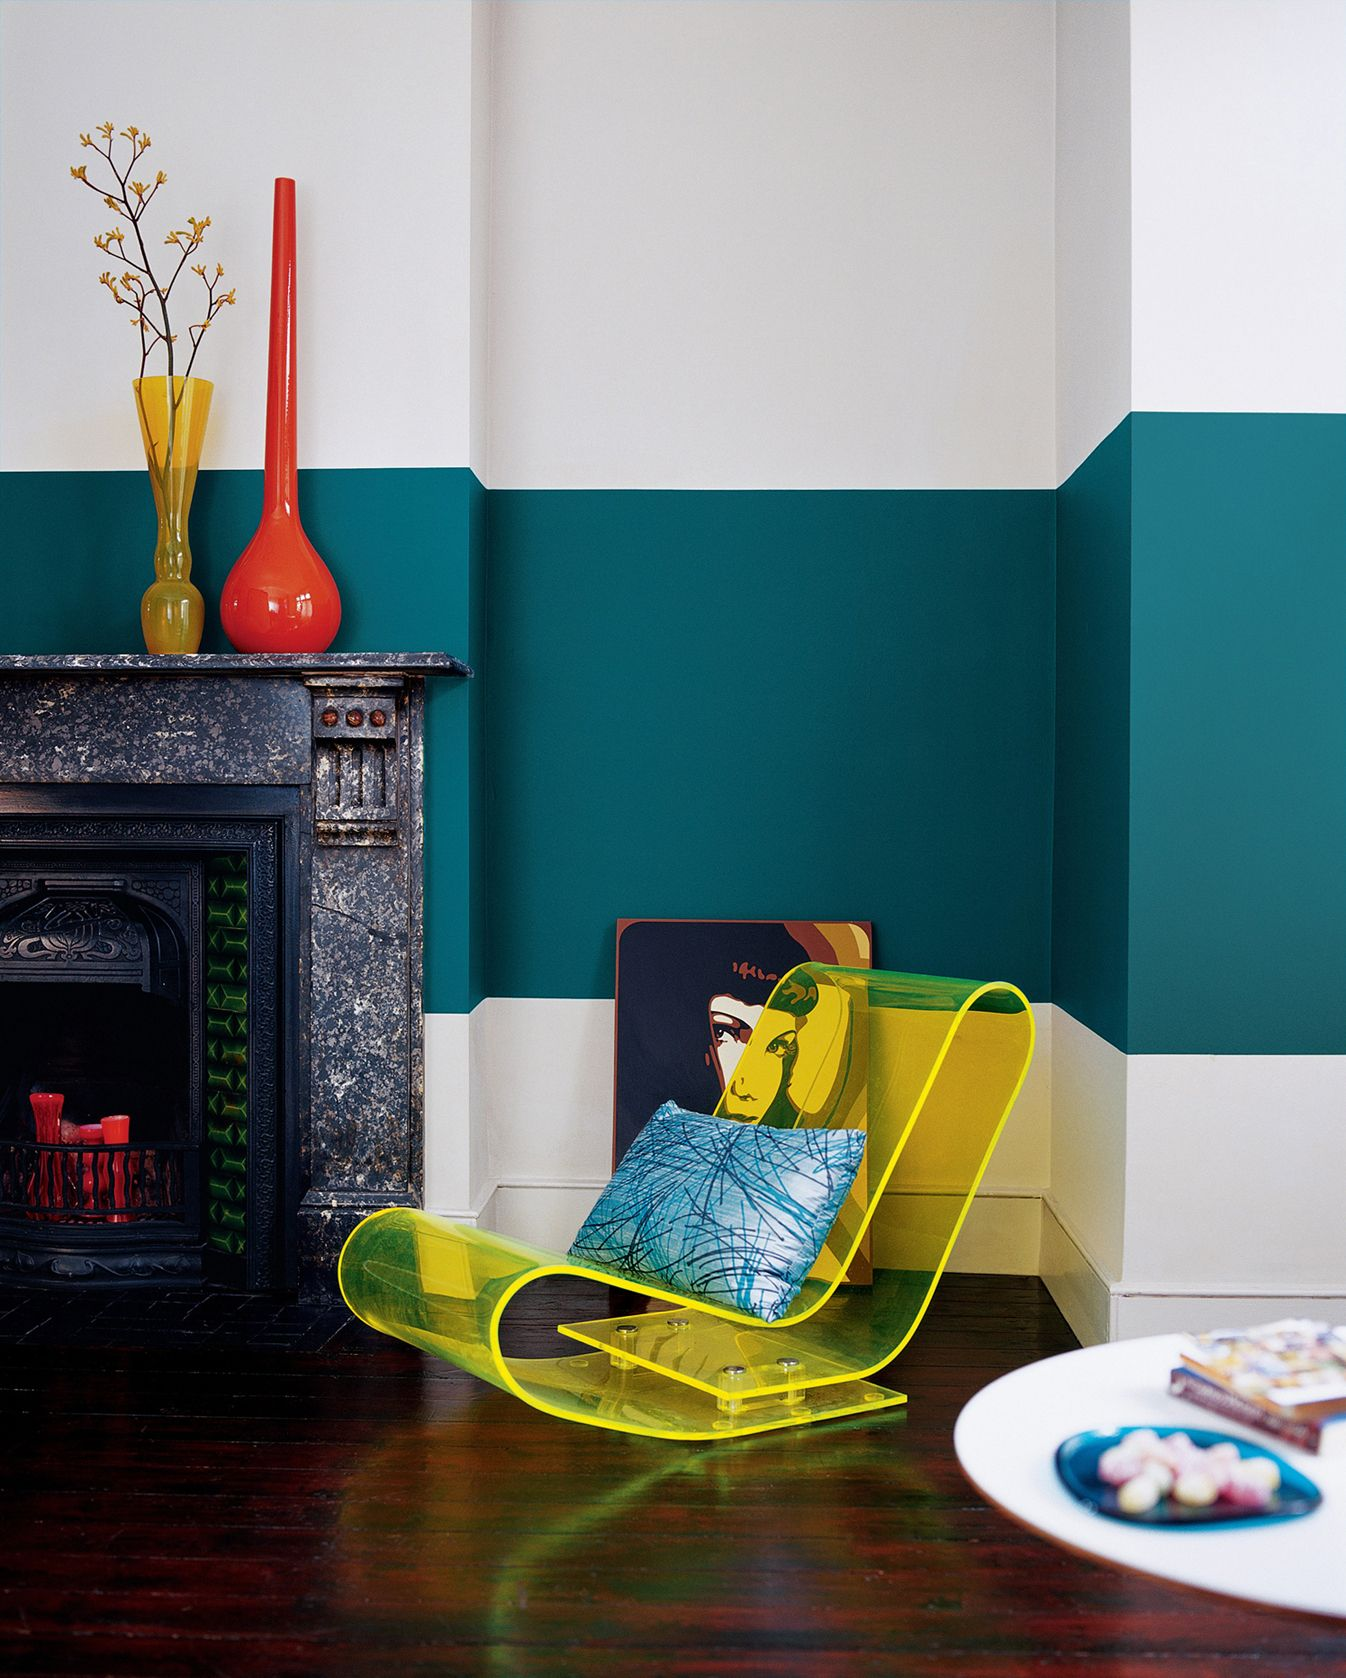 Neon sitting nook interiordesign homedecor color livingroom wall papers reviewsmspy